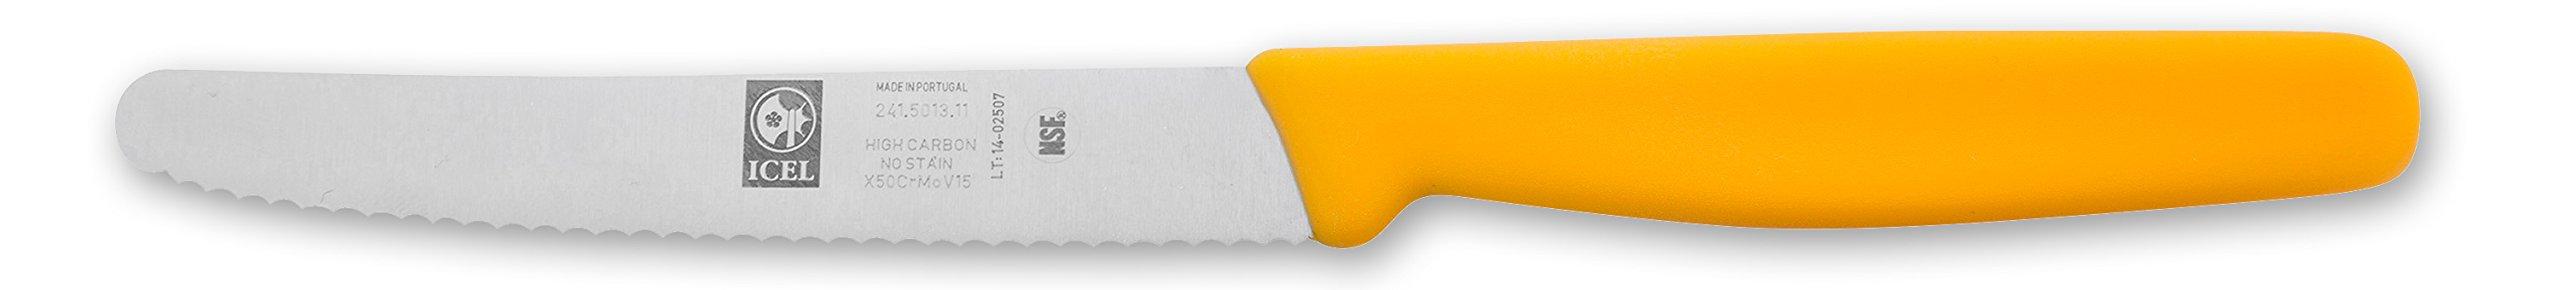 Icel Steak Knife, 4-1/4 Wavy-Edge Blade, Yellow Plastic Handle by Icel